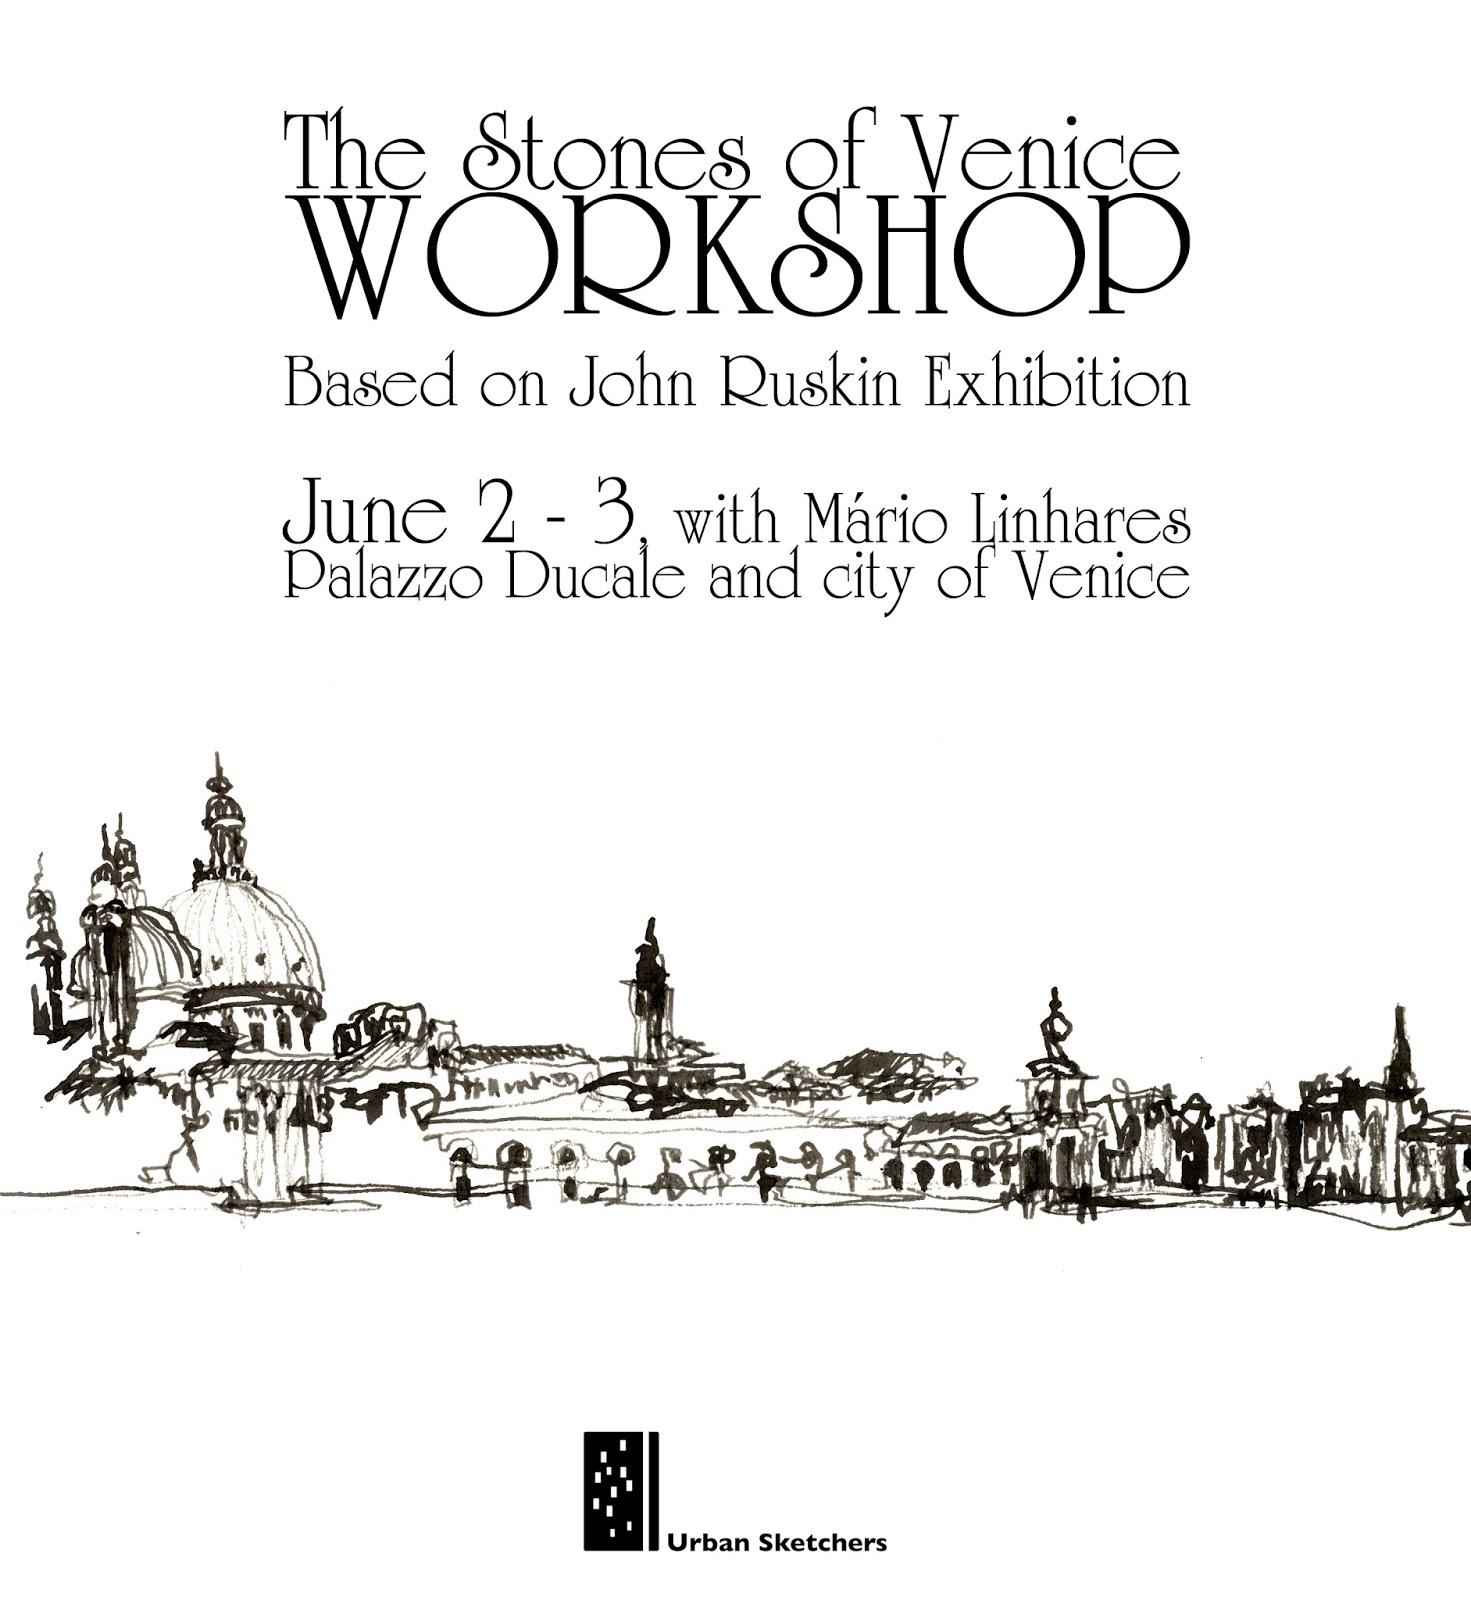 The Stones of Venice Workshop